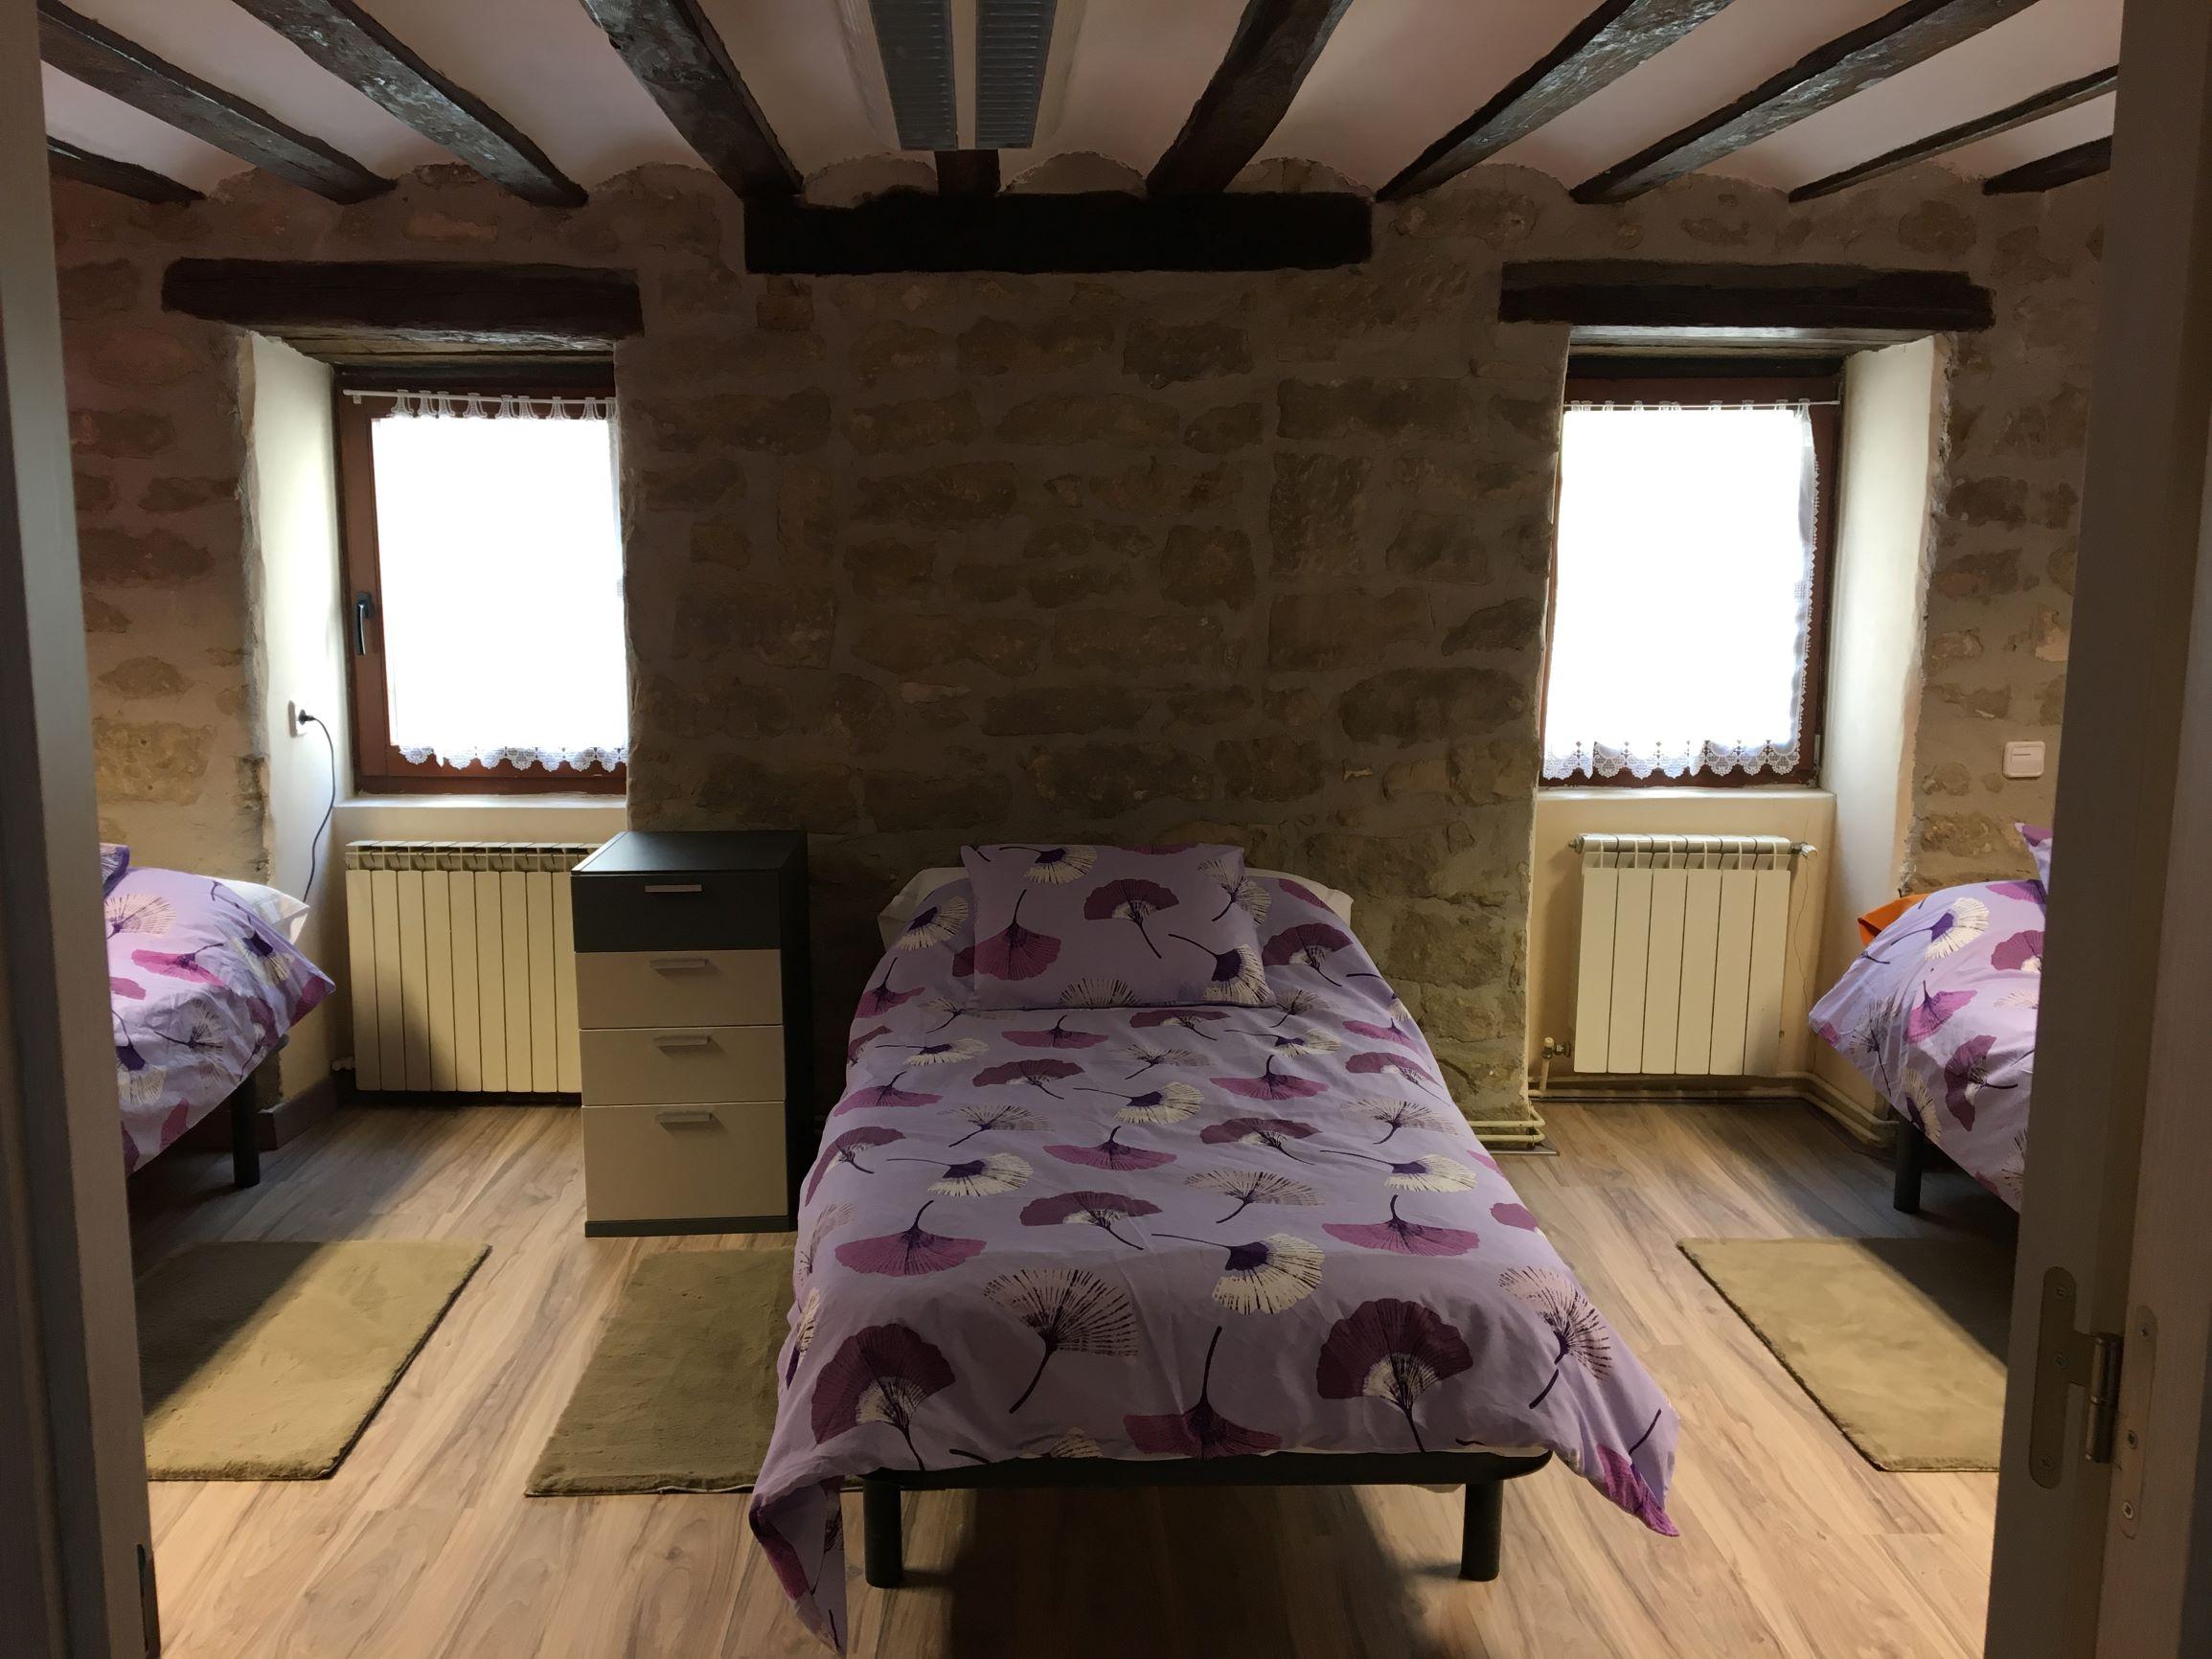 Ferienhaus Casa Rural Lasai Haus (2684718), Biasteri, Alava, Baskenland, Spanien, Bild 3